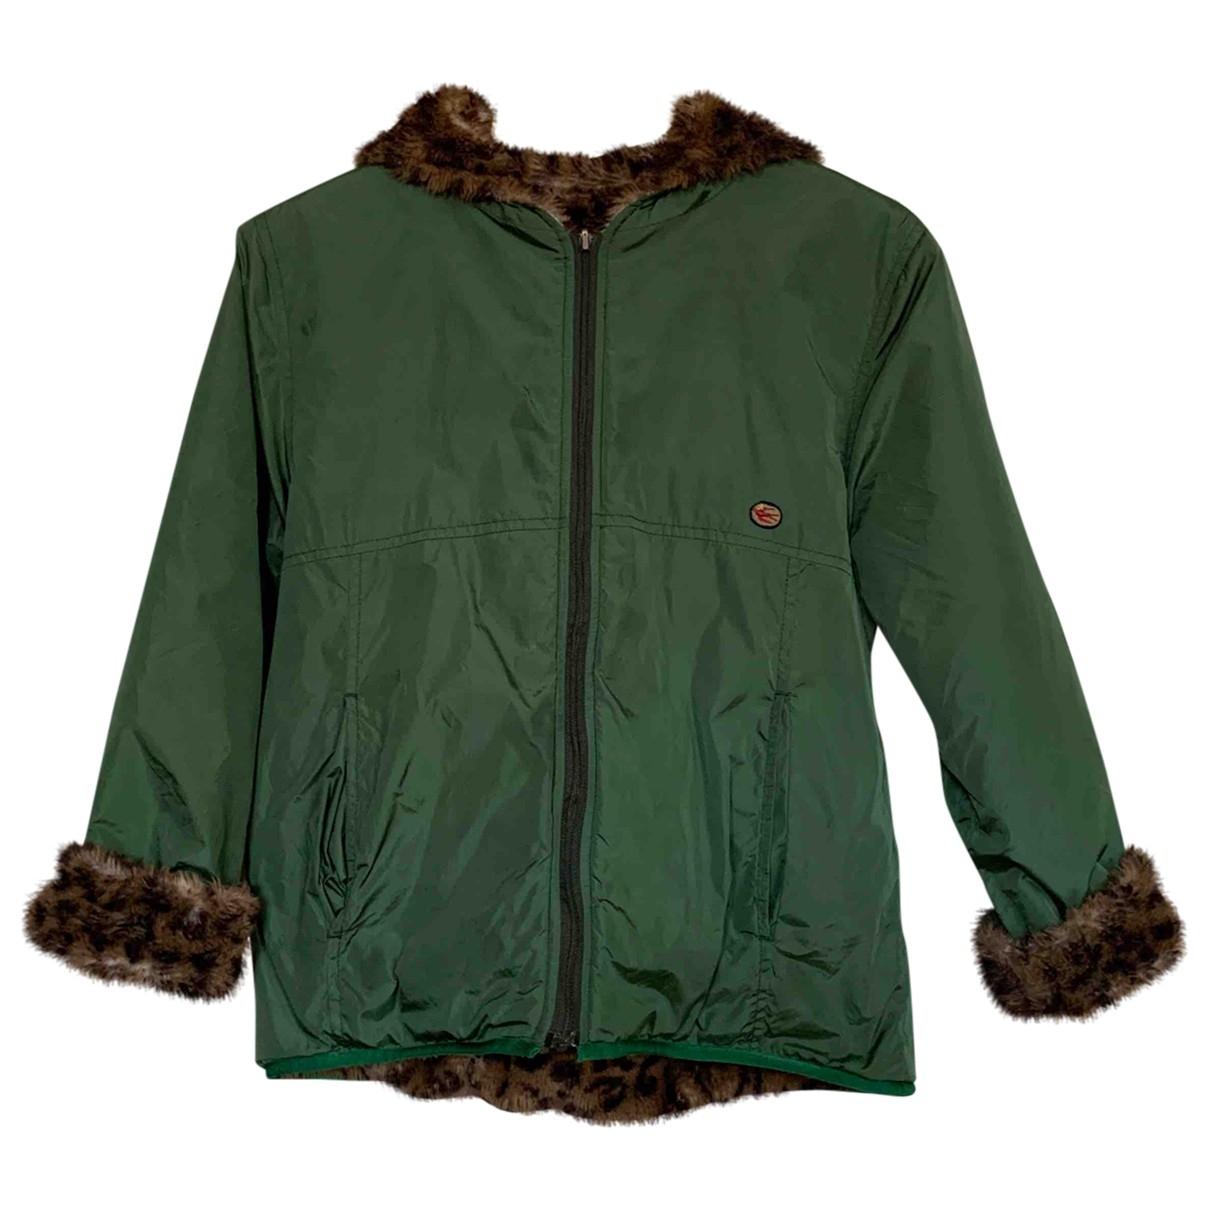 Bellerose \N Khaki jacket & coat for Kids 12 years - XS FR